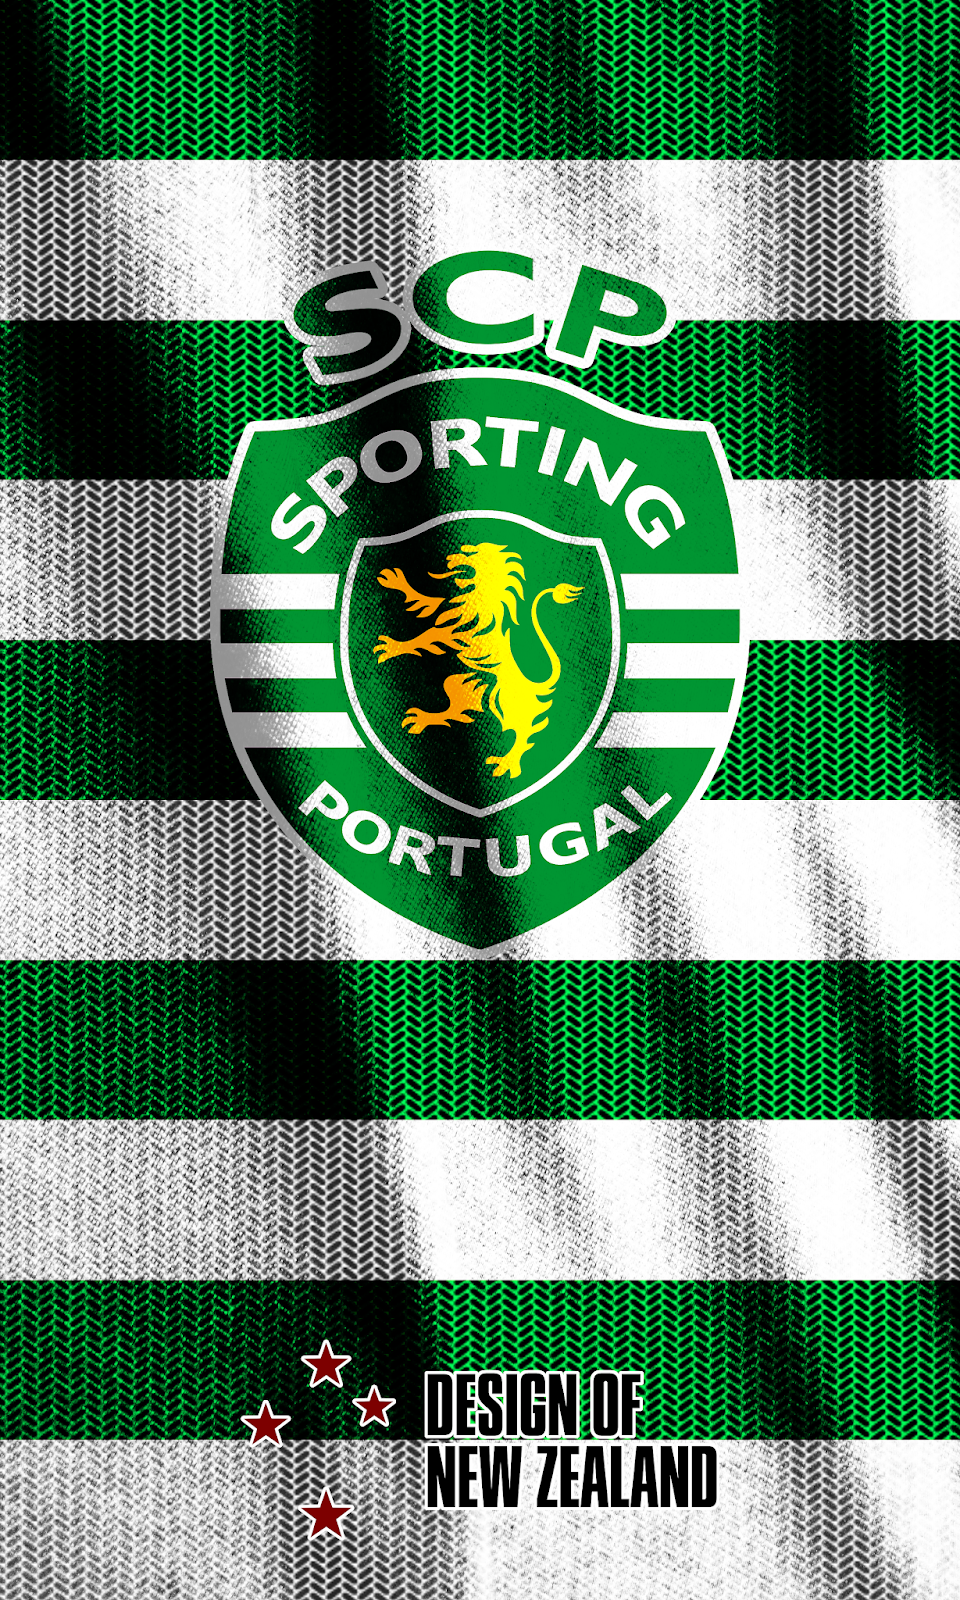 Sporting Clube De Portugal Sporting Sporting Clube De Portugal Sporting Clube